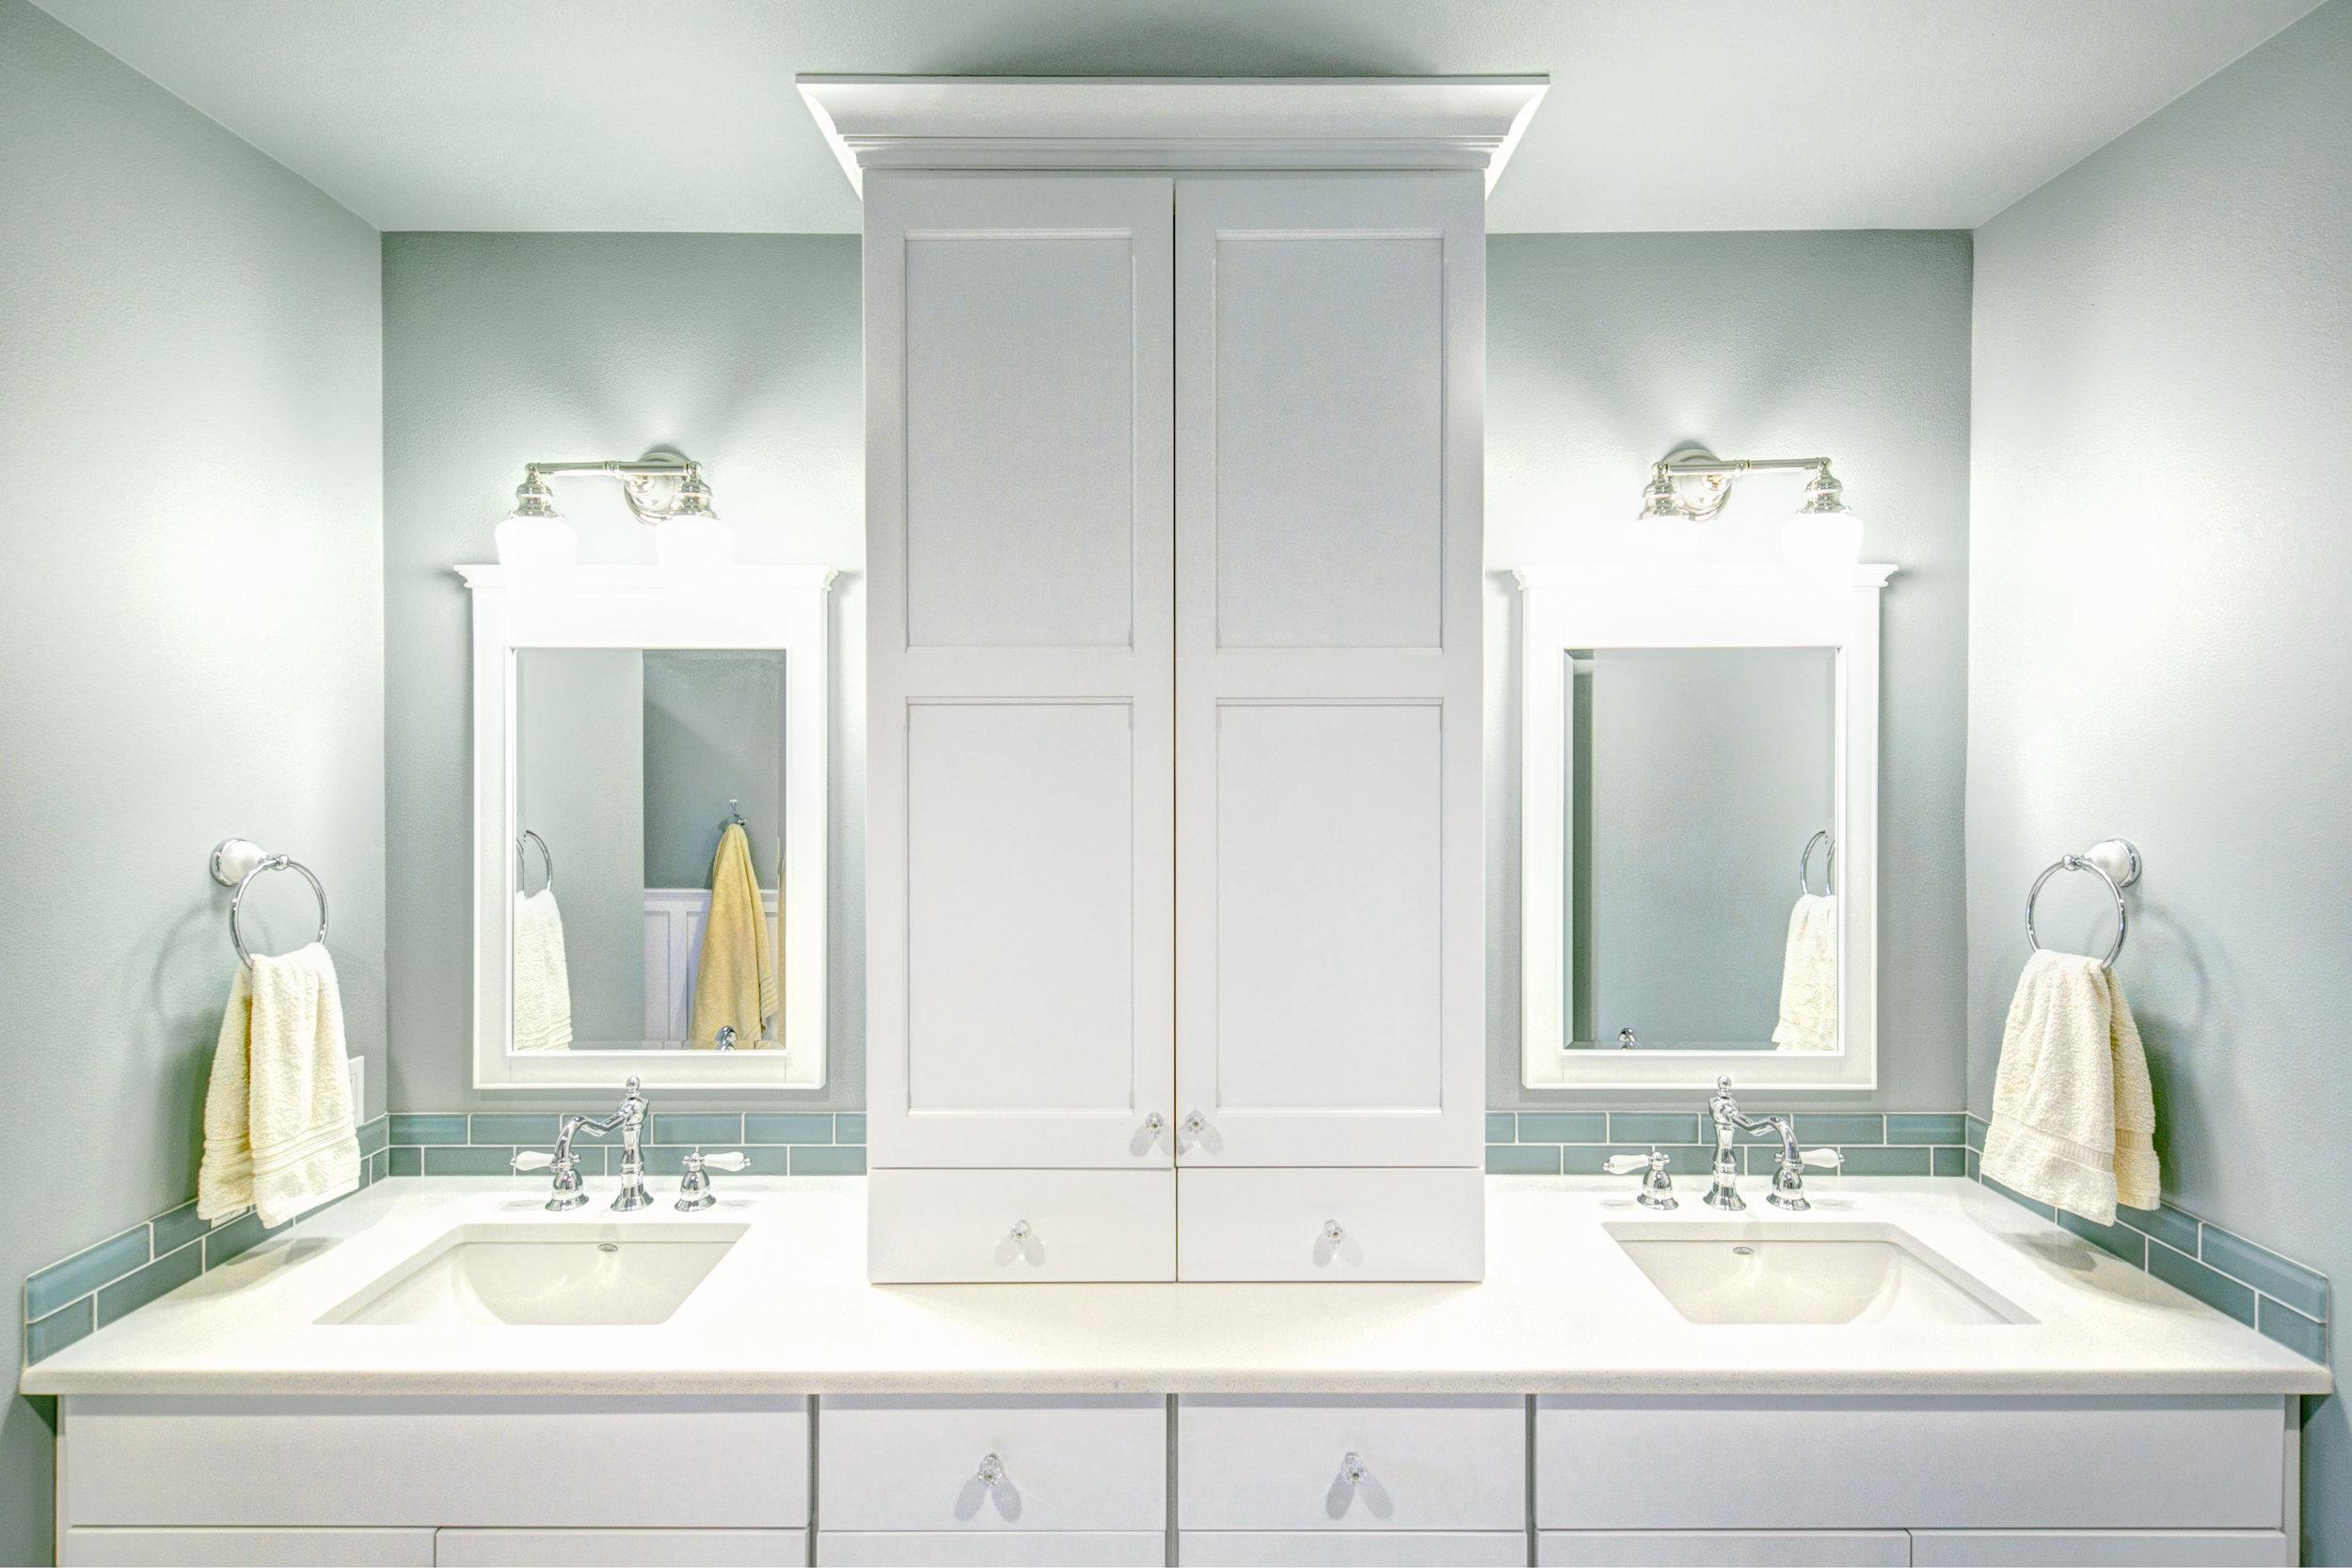 mandy callaway interiors-greenlake house-00018.jpg